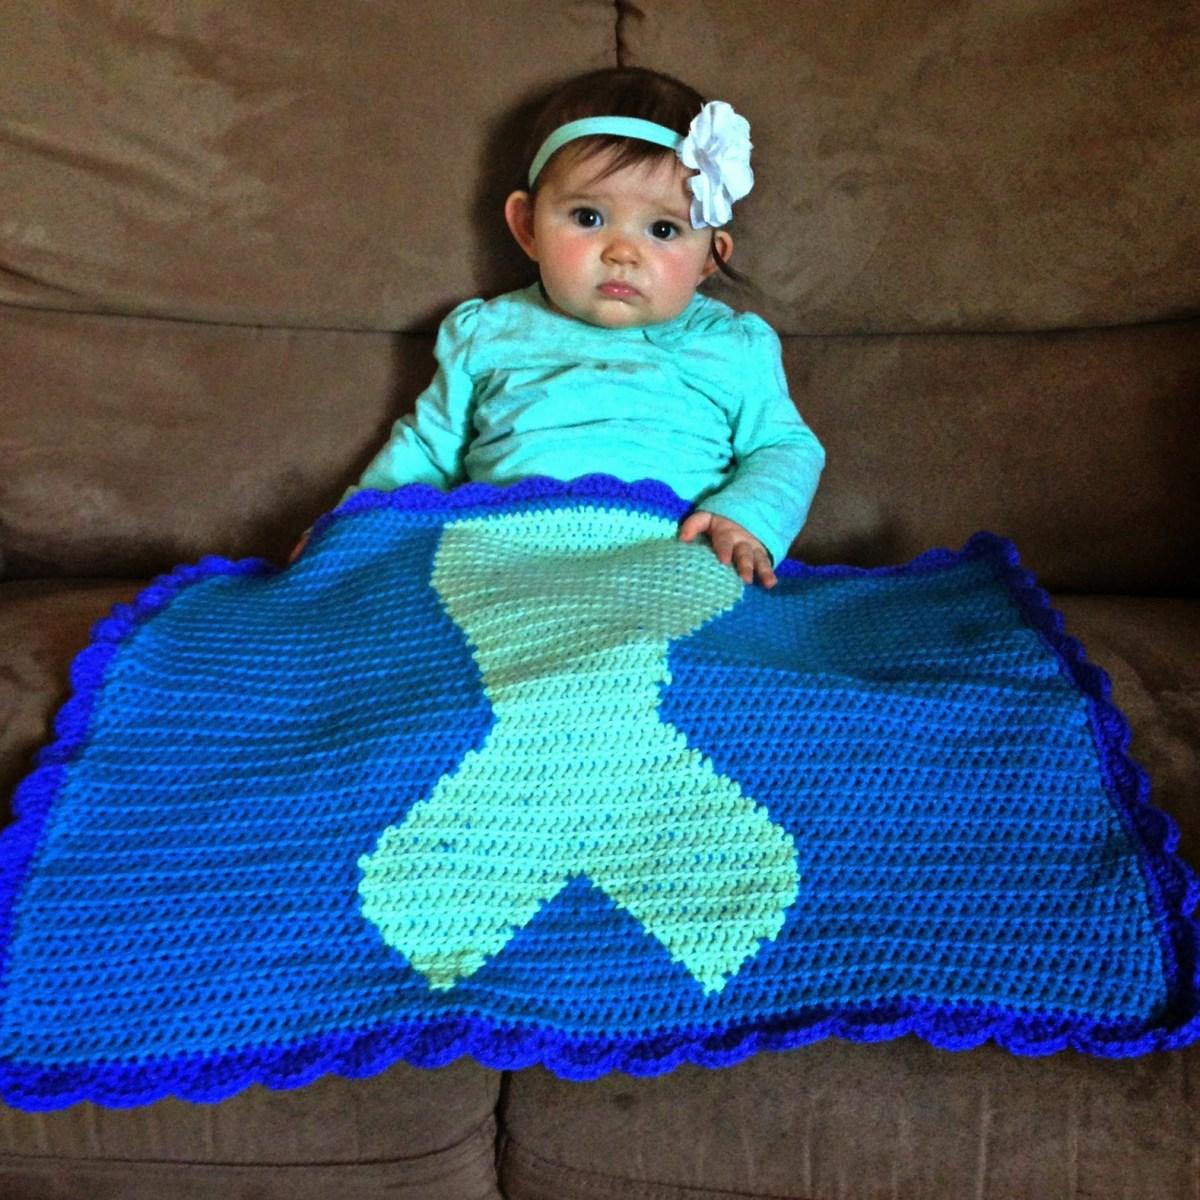 Amazing Crochet Mermaid Pattern for Baby's Mermaid Tail Free Crochet Mermaid Tail Blanket Pattern Thefriendlyredfox